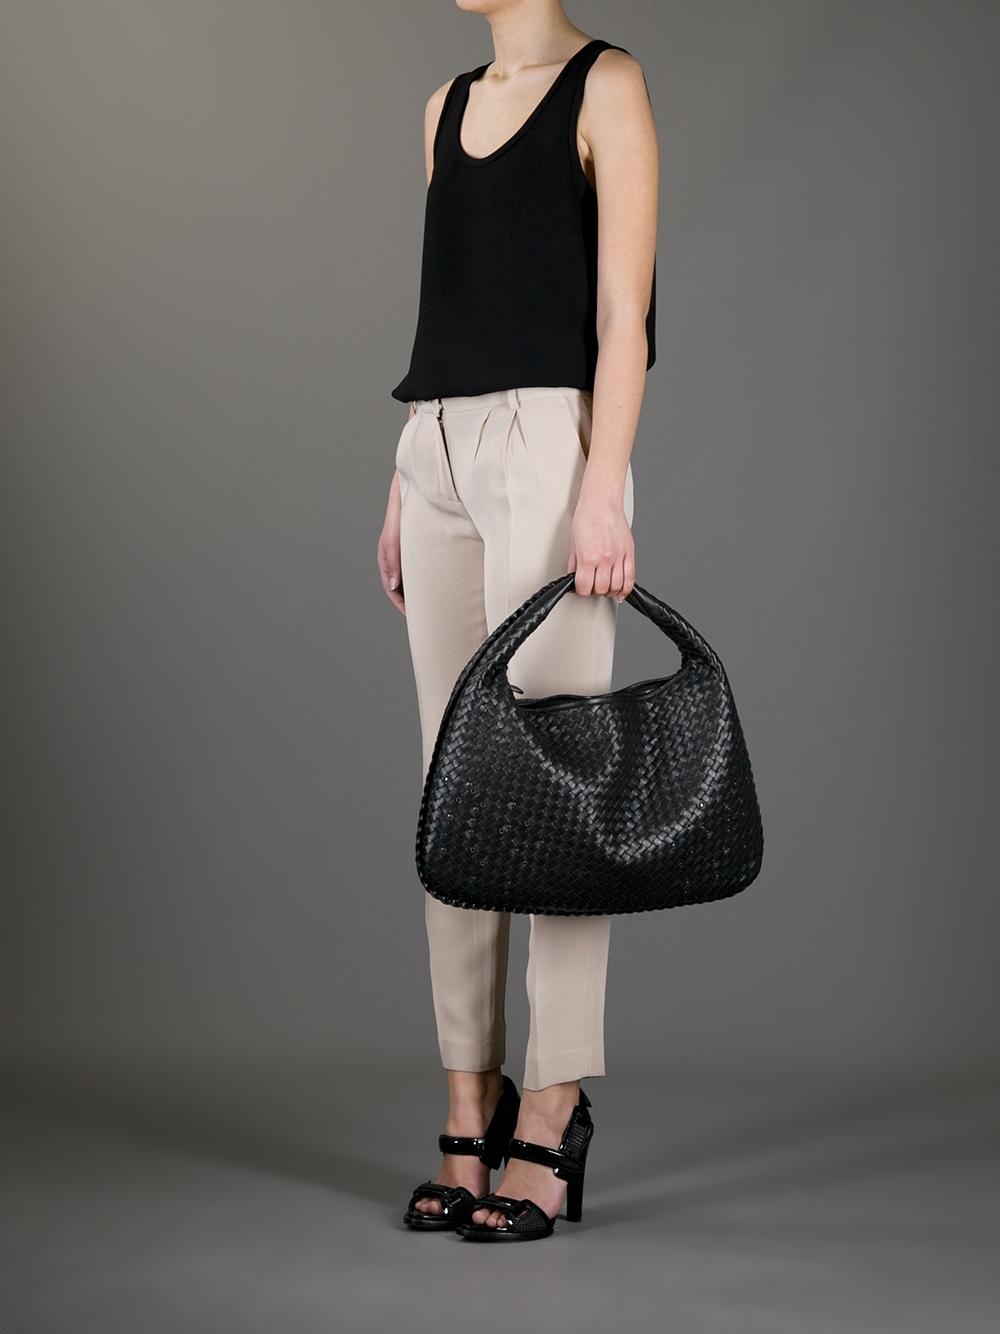 Veneta Large Intrecciato Leather Shoulder Bag - Black Bottega Veneta Many Colors Sale Top Quality Pay With Visa Sale Online Buy Cheap Affordable uilPF